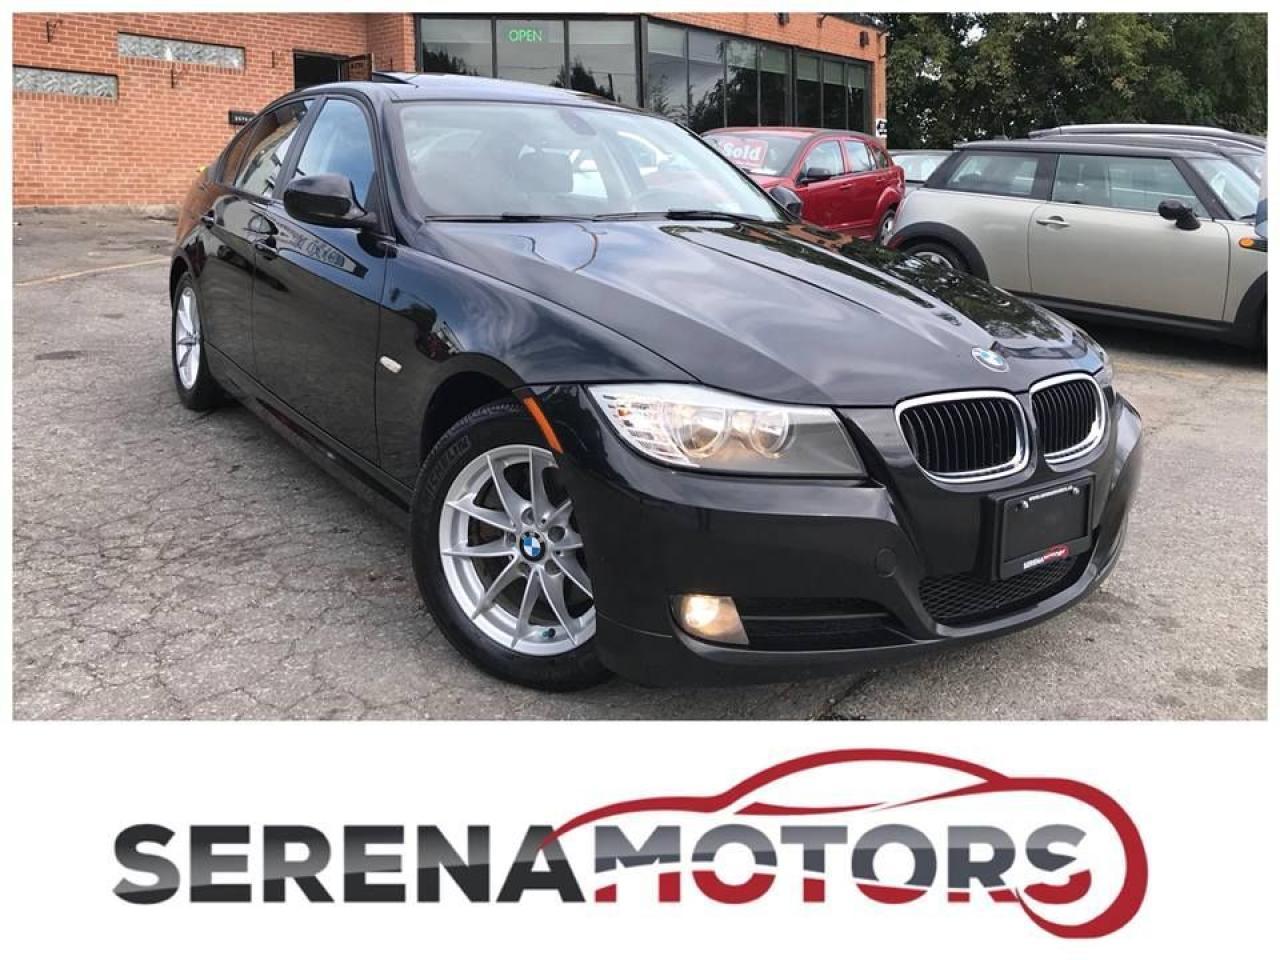 2011 BMW 3 Series 323i | LEATHER | SUNROOF | BLUETOOTH | 6 SPEED